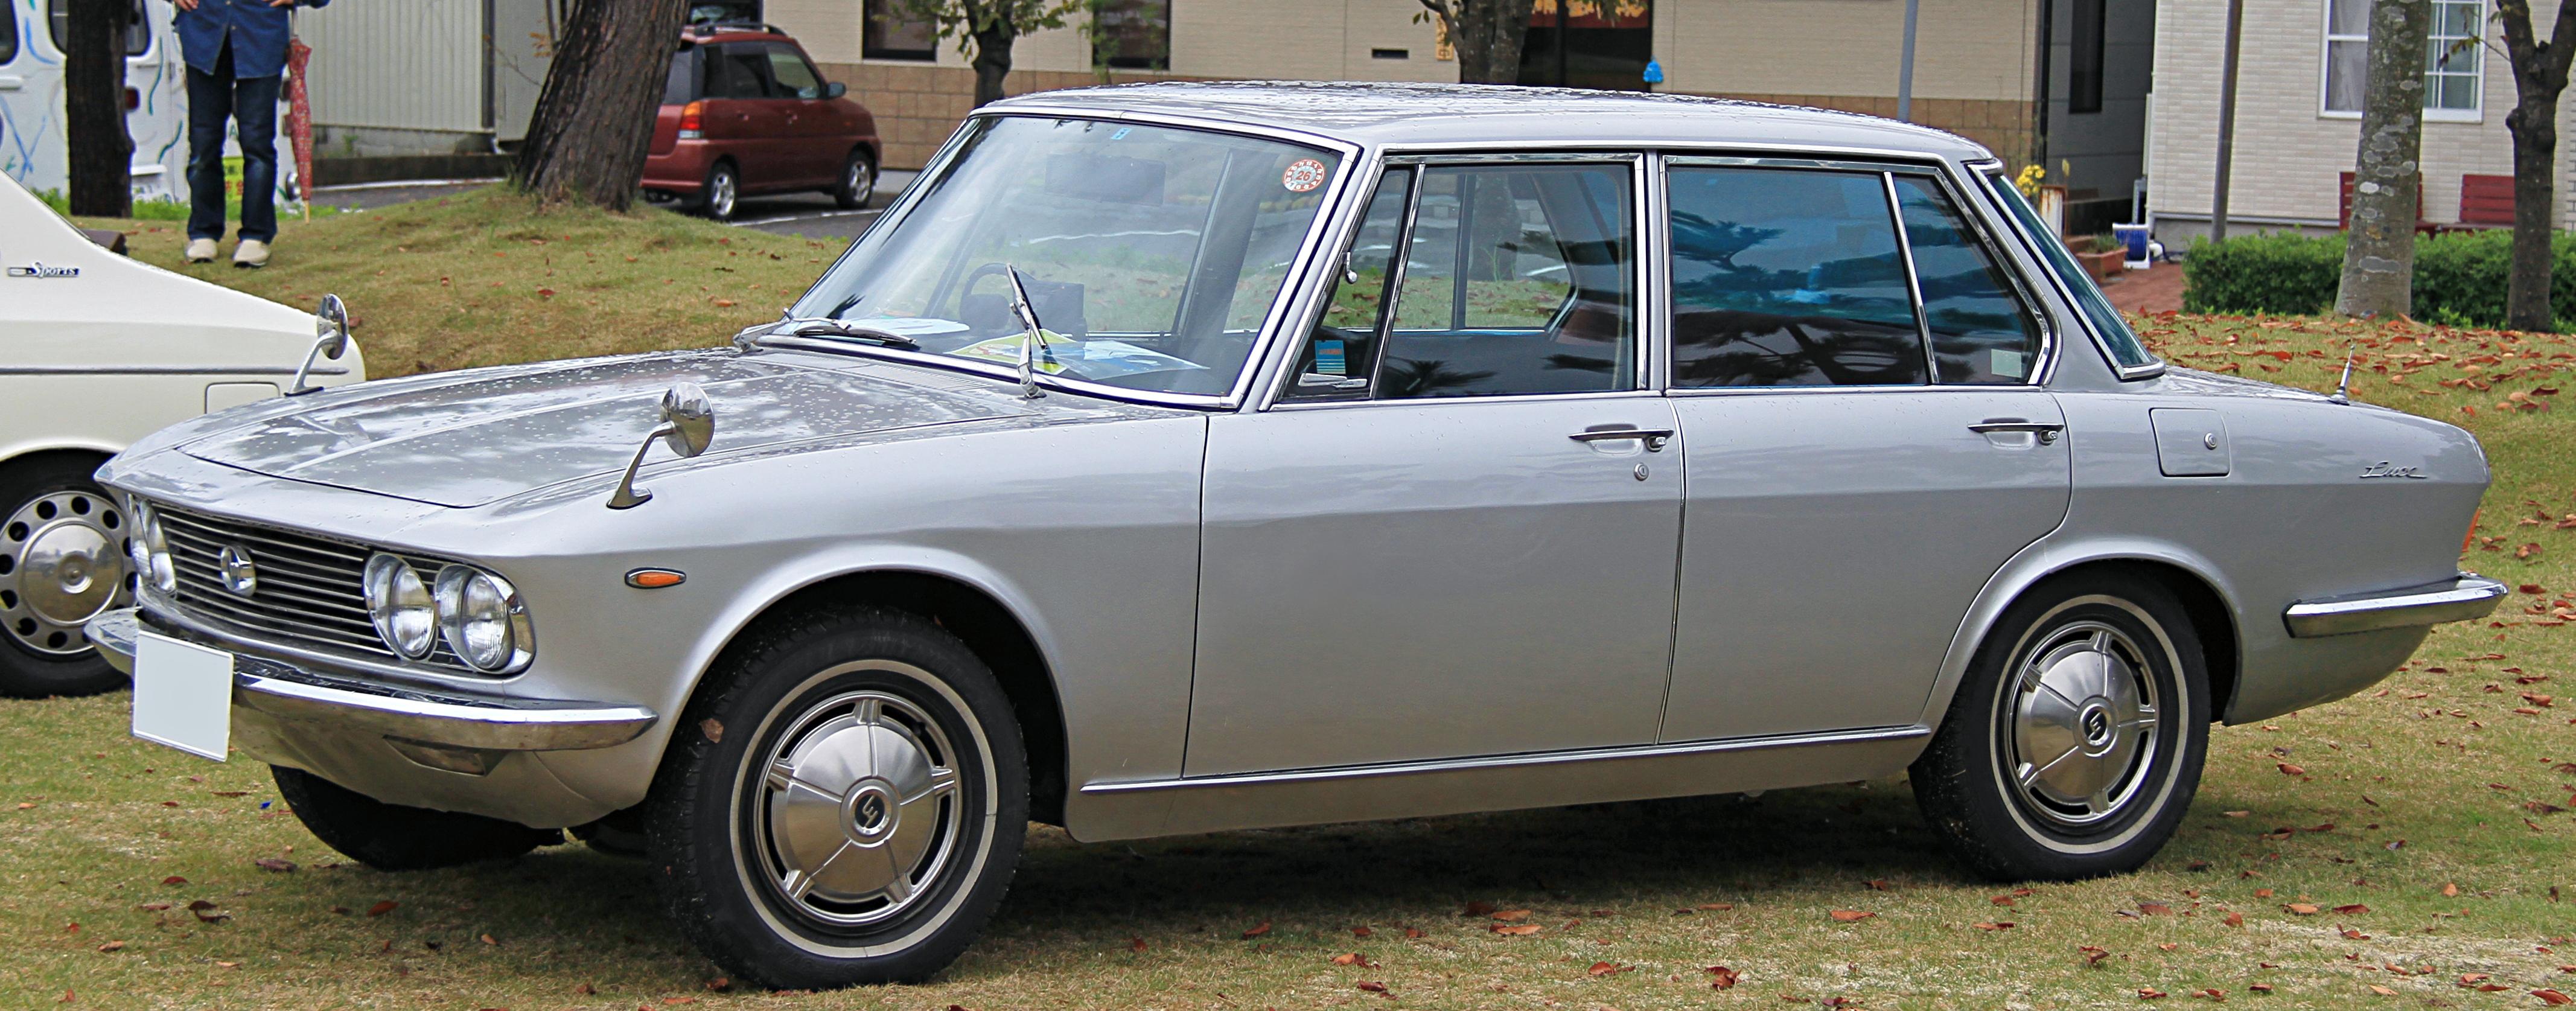 Mazda Luce III 1977 - 1981 Sedan #5